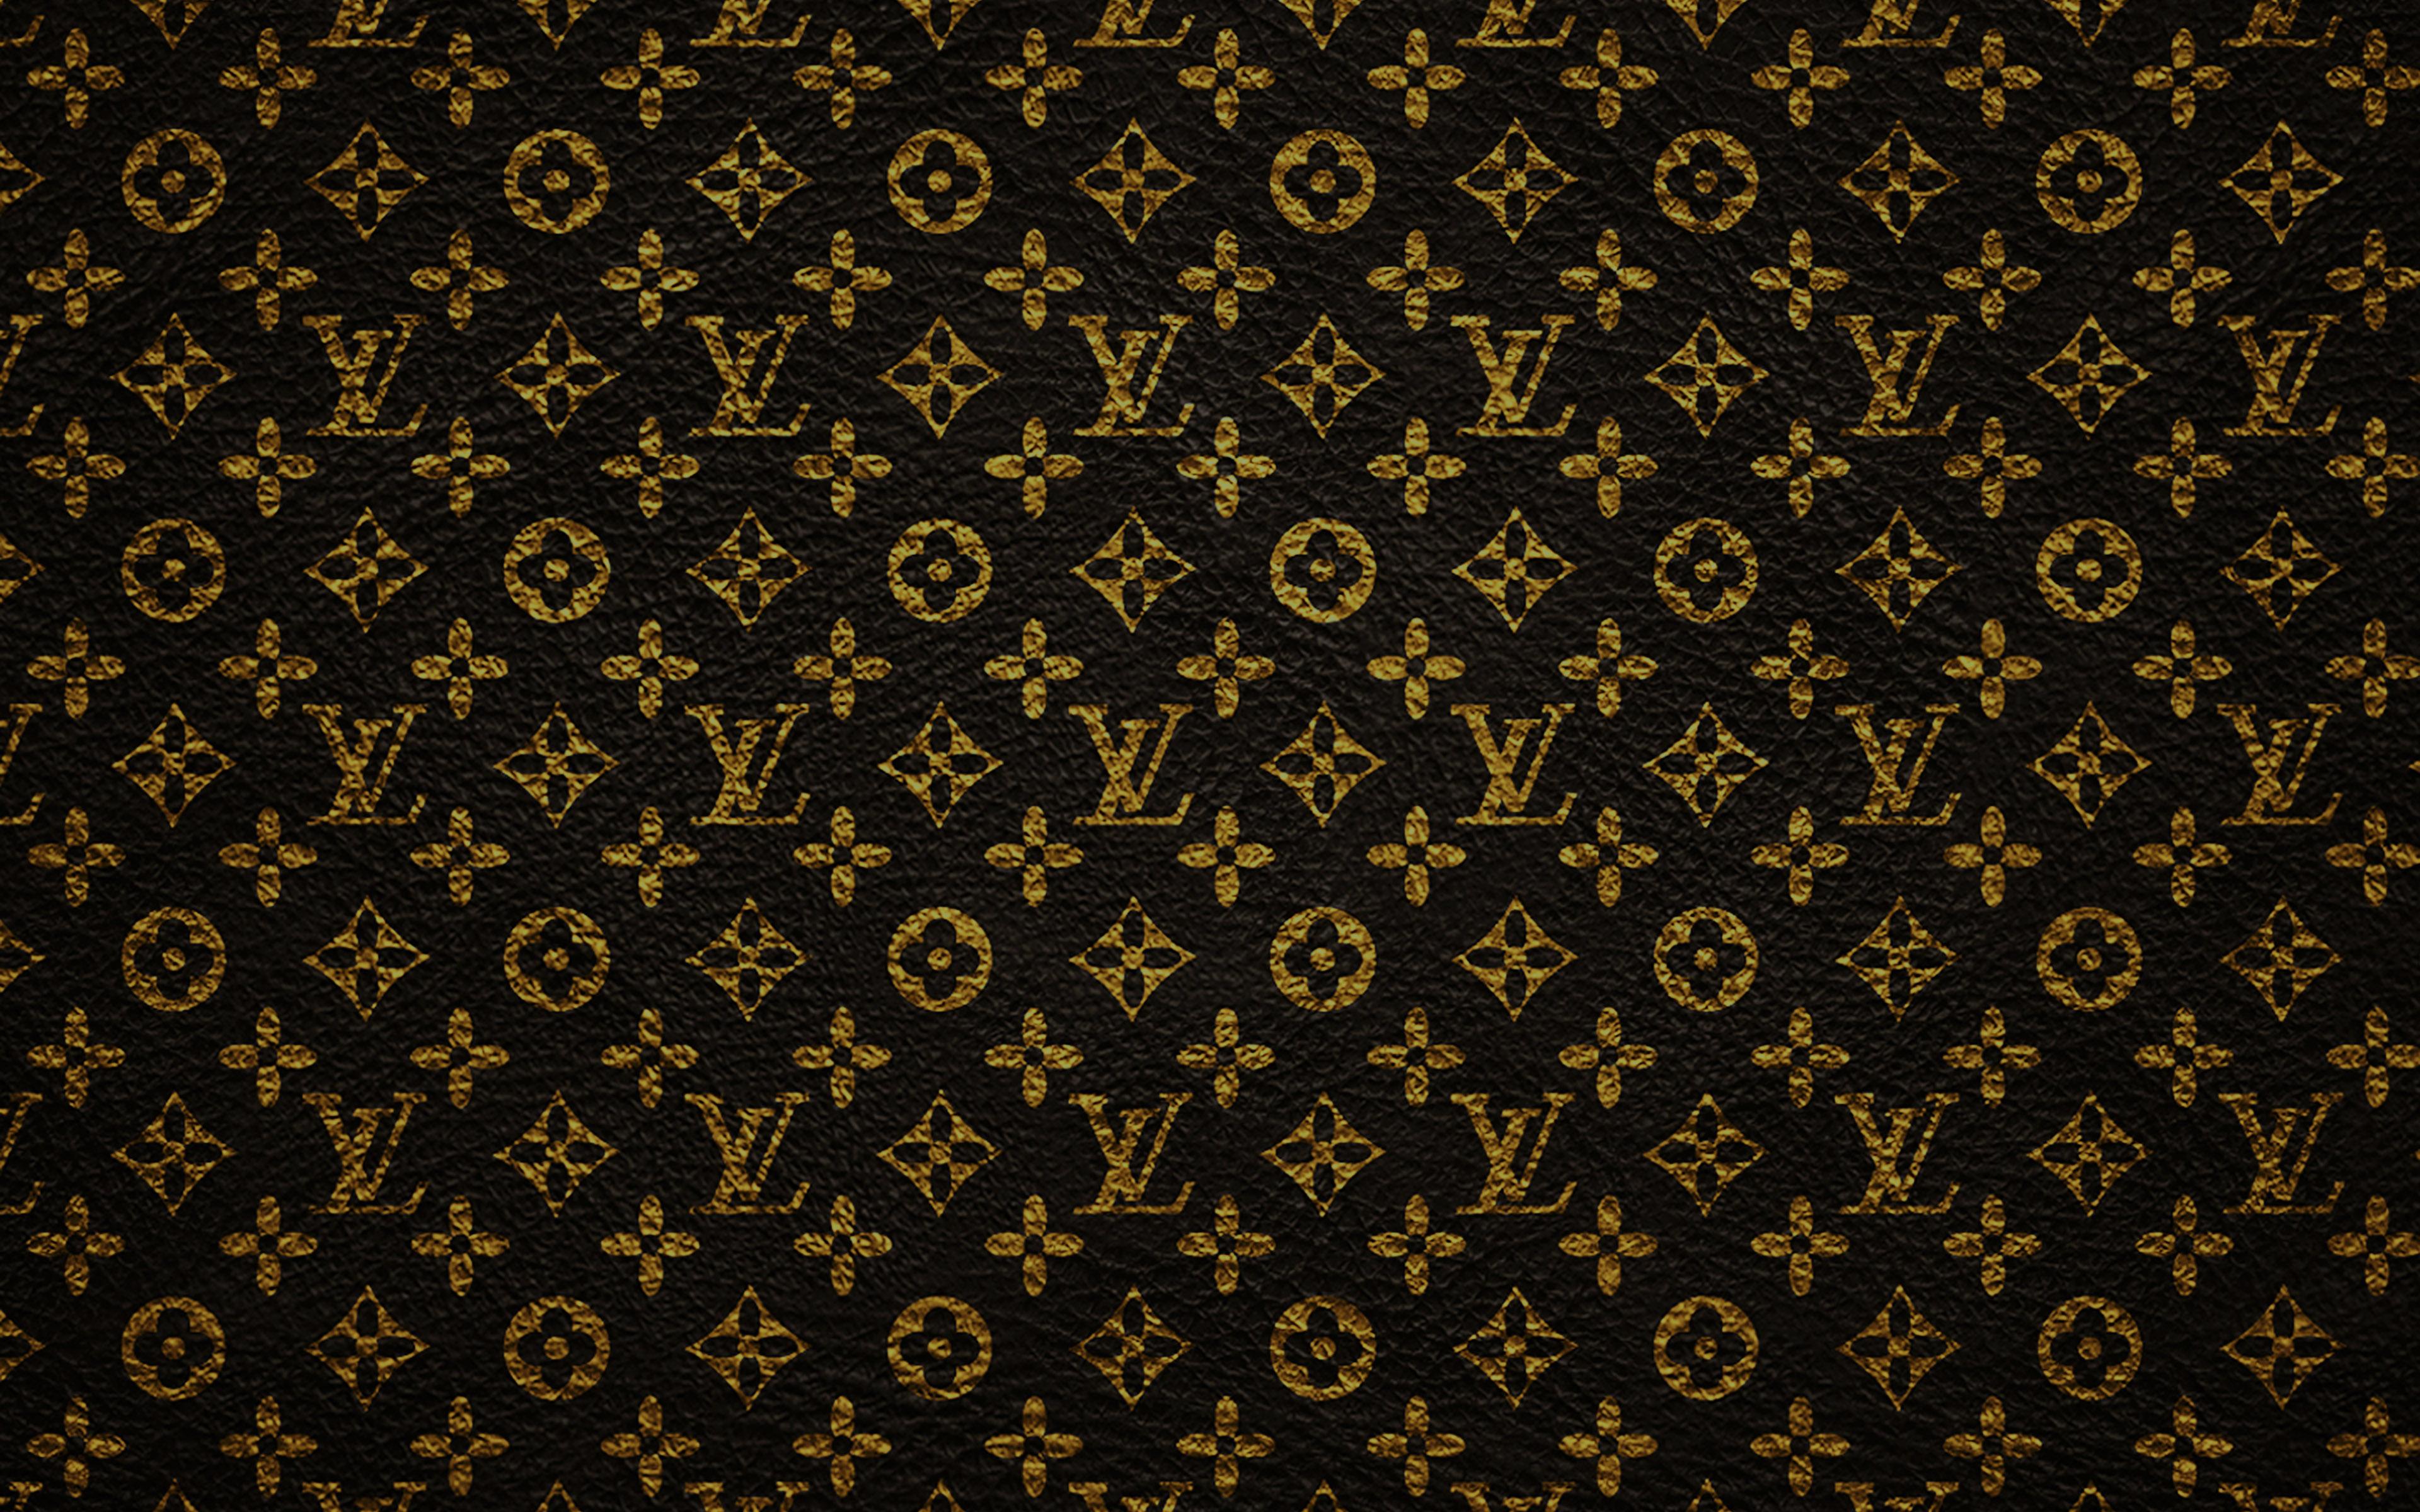 louis vuitton wallpaper 4k